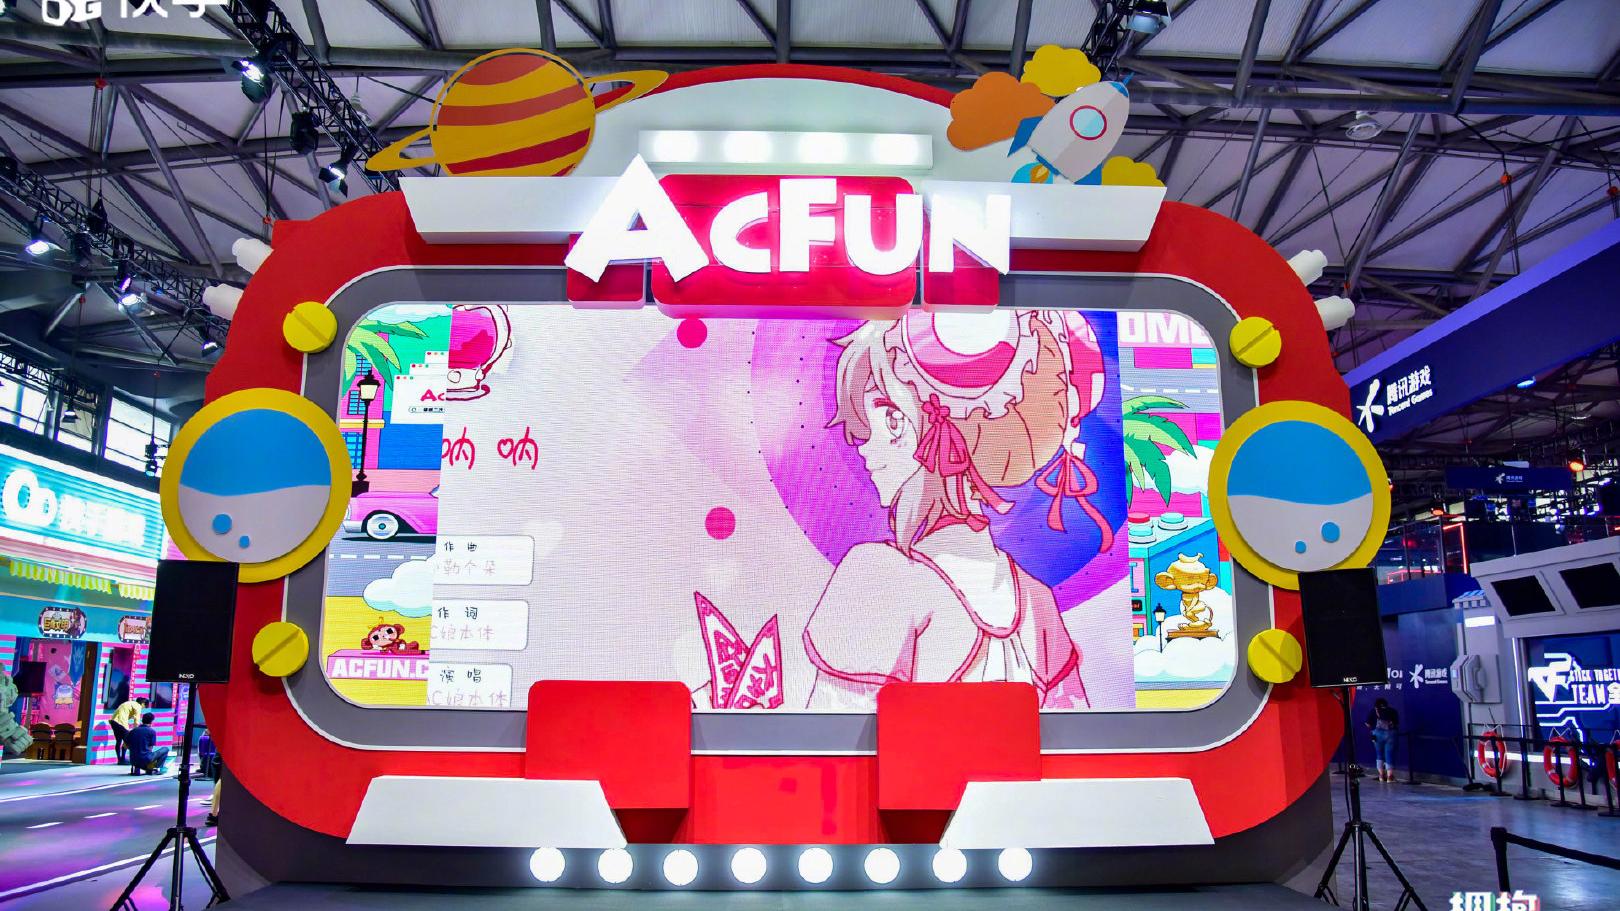 【CJ ACFUN现场】AC娘和绛紫来啦 CJ 快手主舞台 A站时间录屏